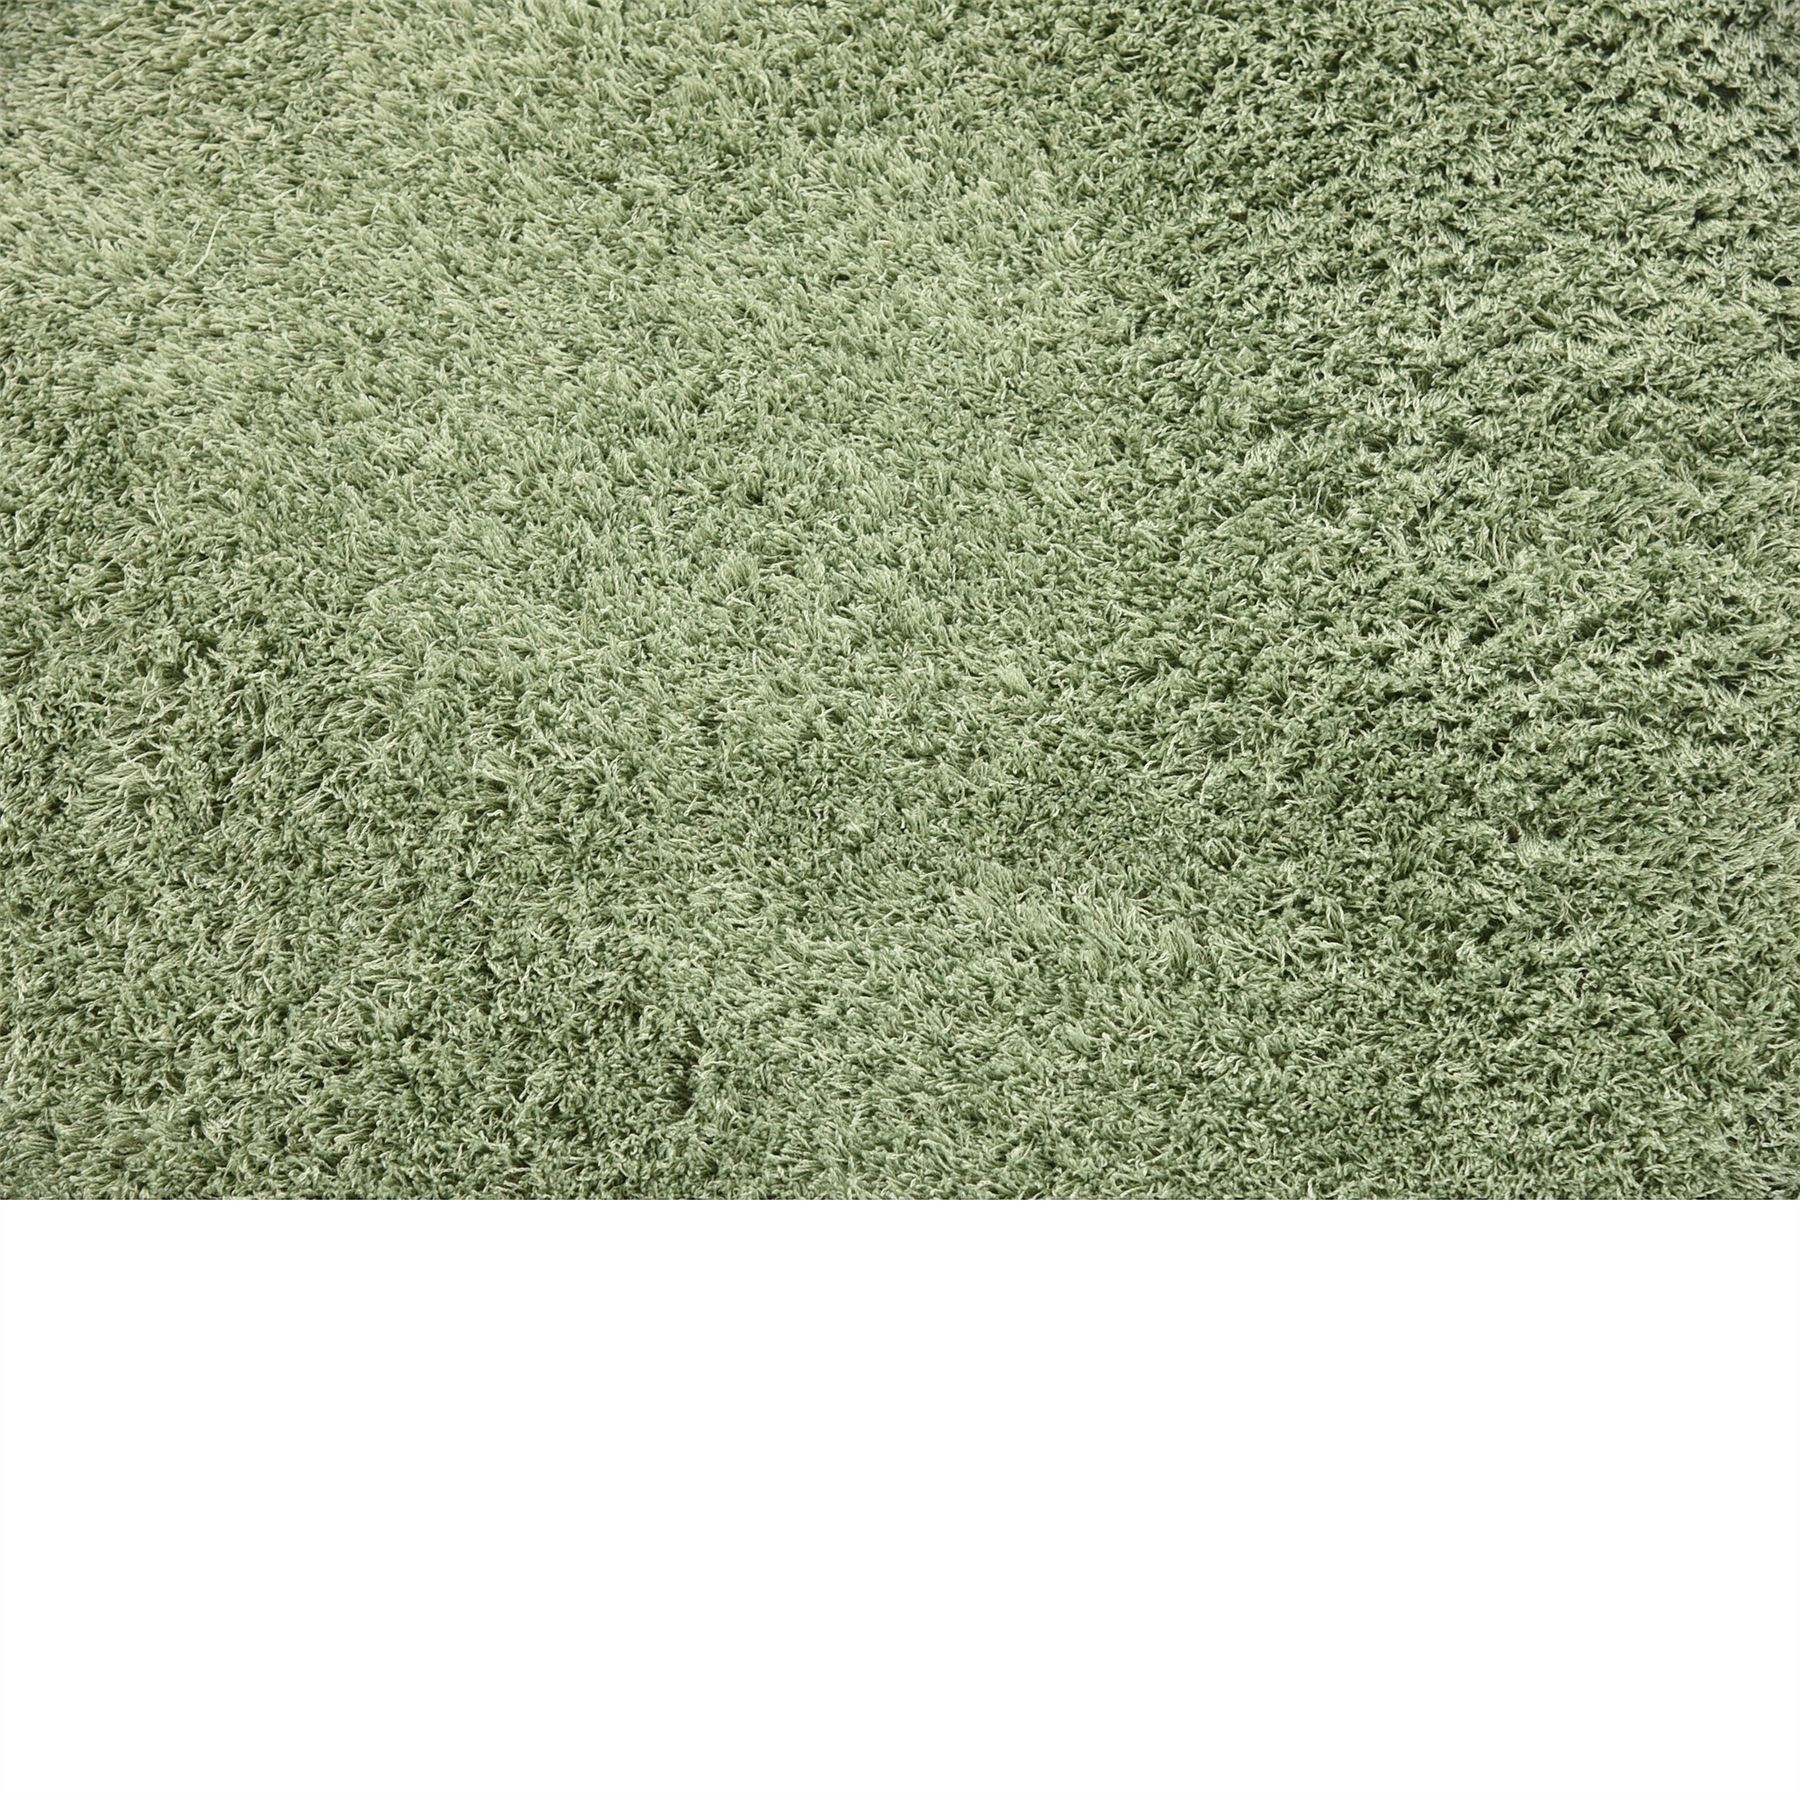 Modern Shaggy Carpet Solid Plush Shag Area Rug